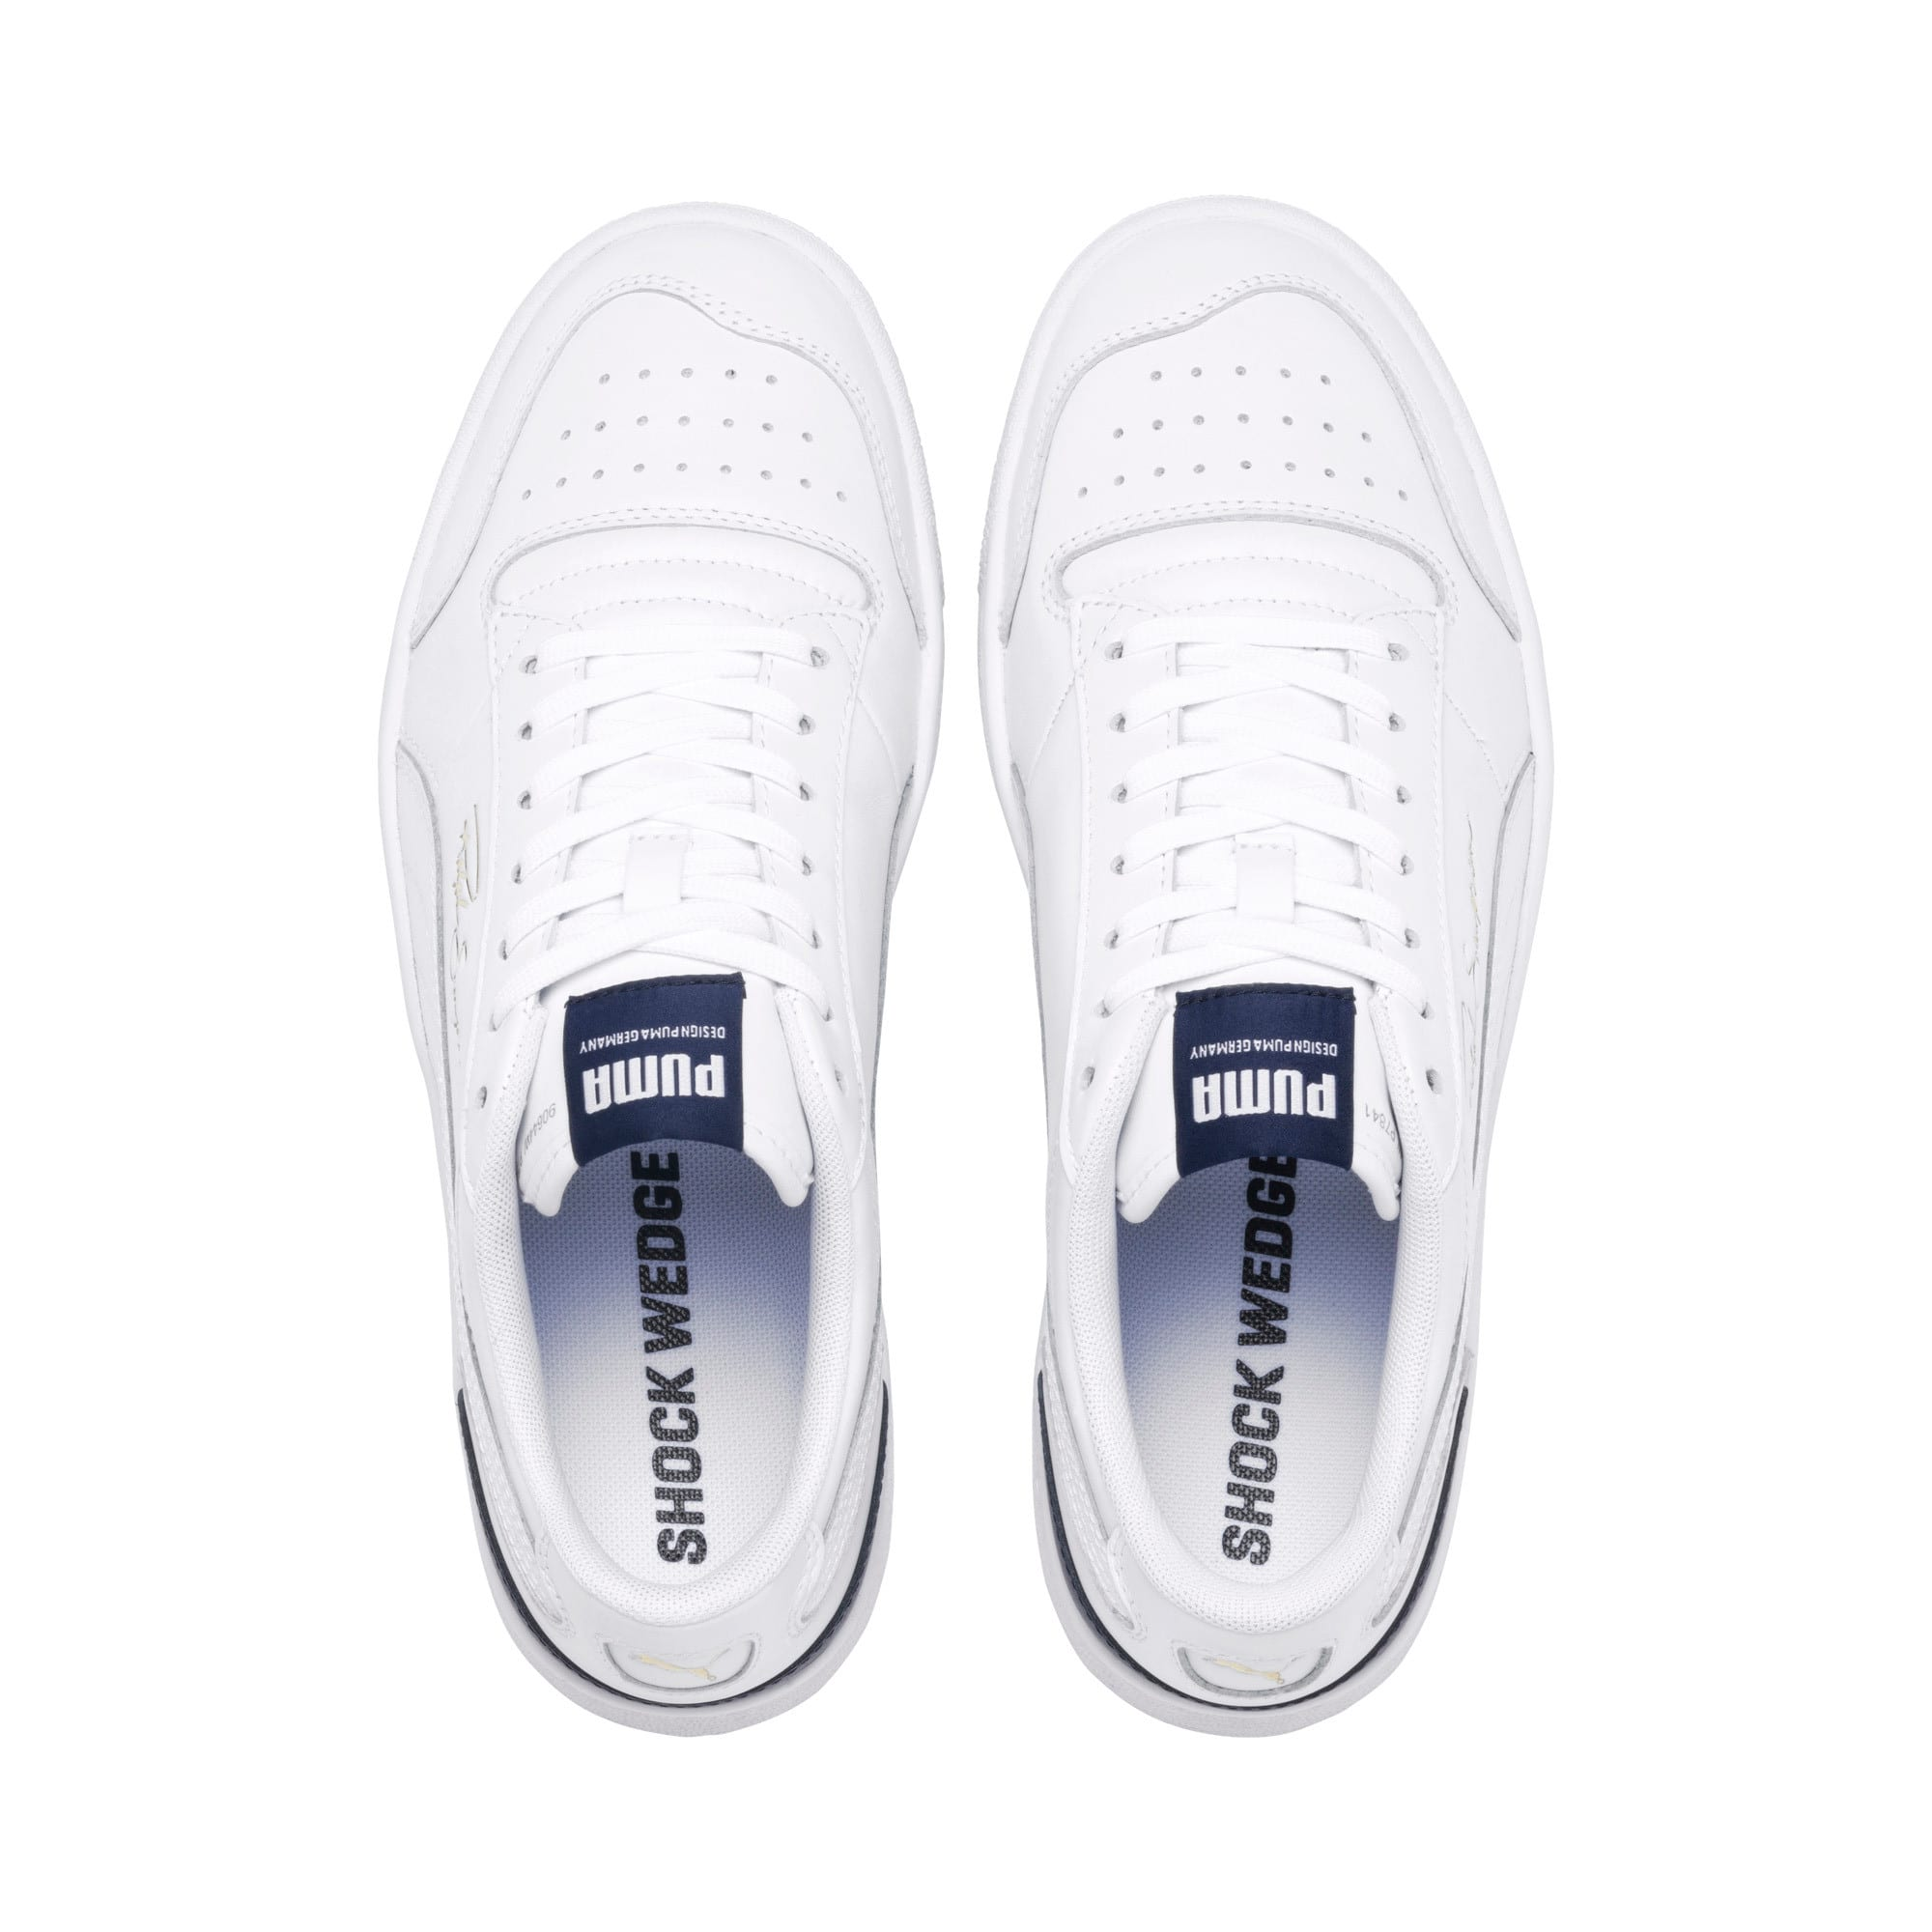 Thumbnail 6 of Ralph Sampson Lo Sneakers, Puma Wht-Peacoat-Puma Wht, medium